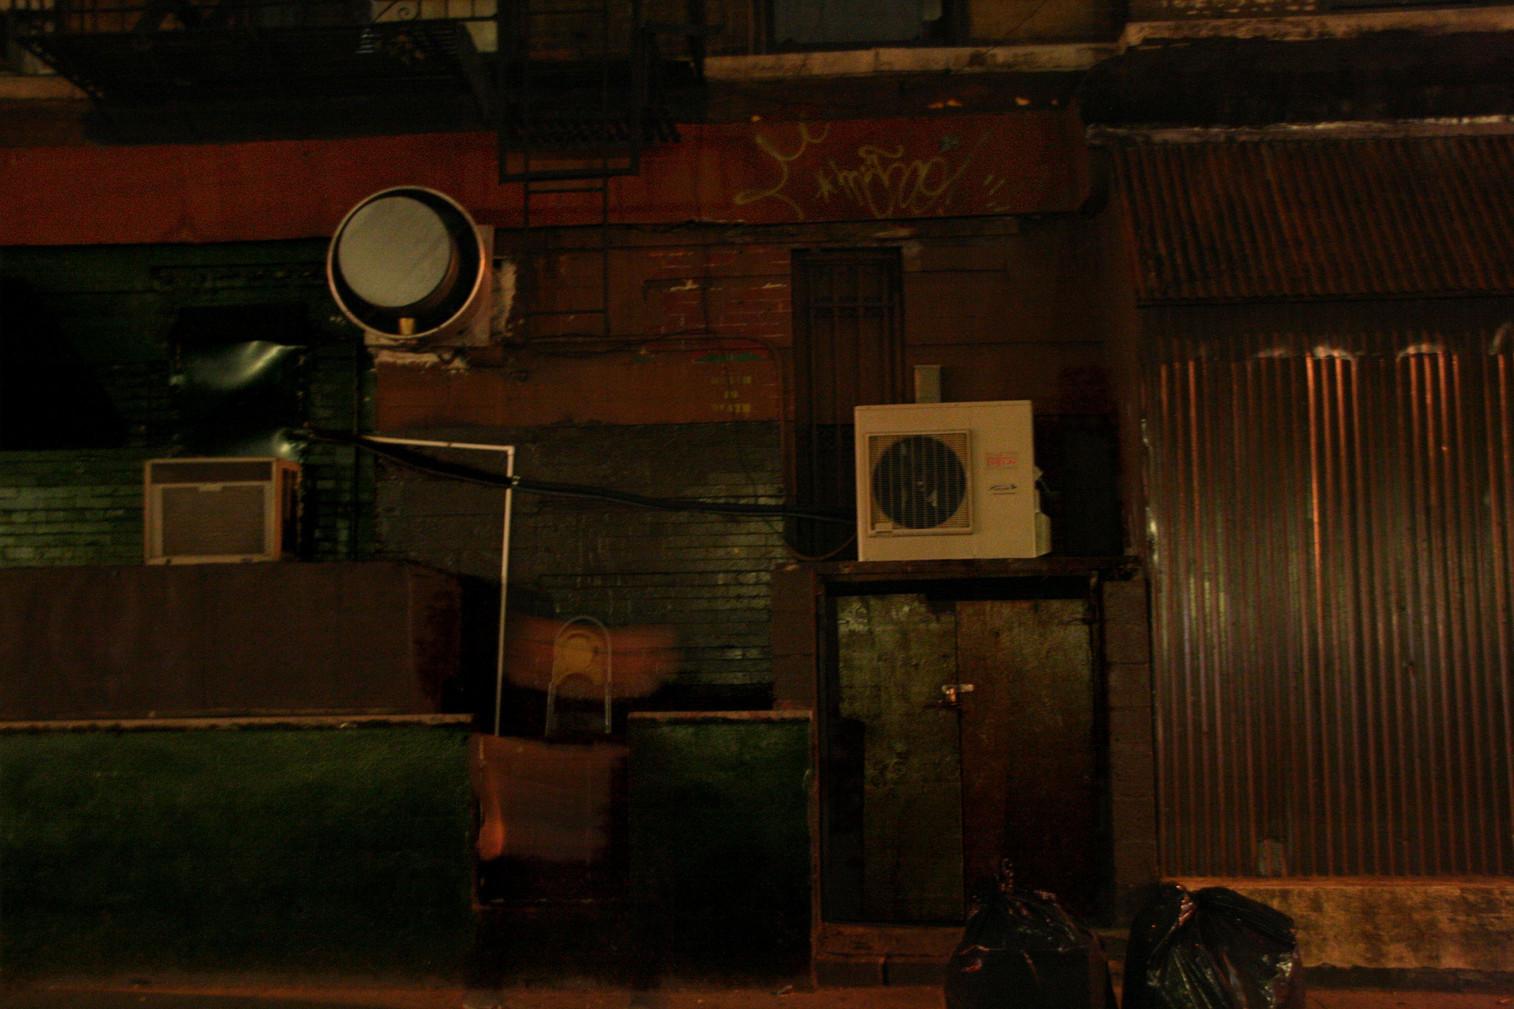 23_New York Polyphony, 2008, Fotografie,